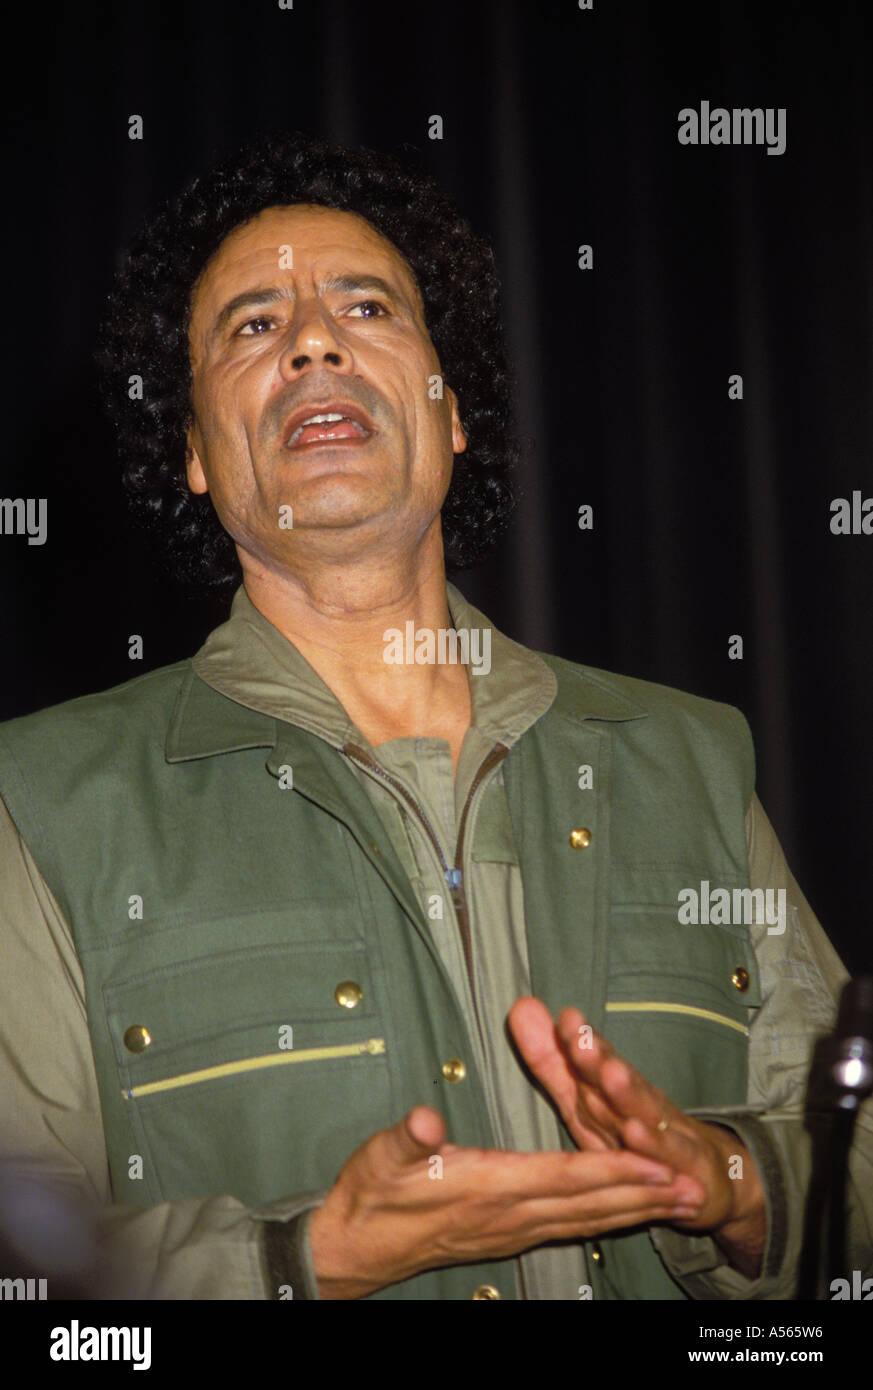 Colonel Muammar al Gaddafi Libya - Stock Image